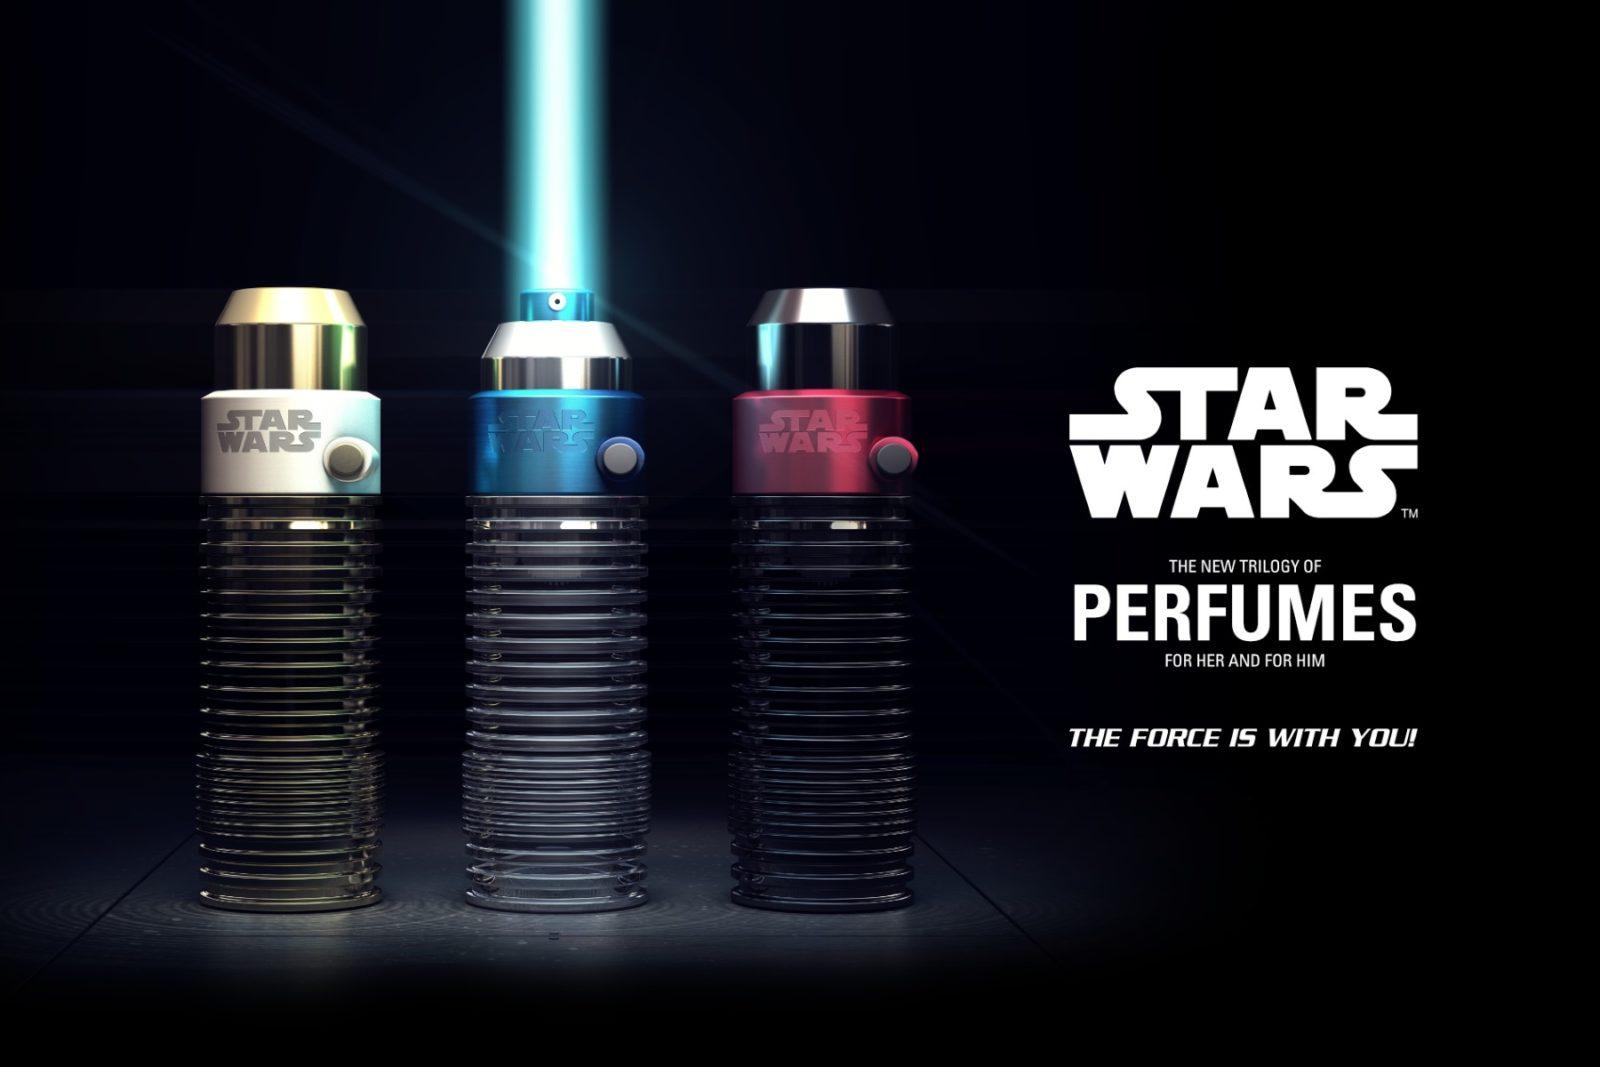 Women's Star Wars Queen Amidala Perfume